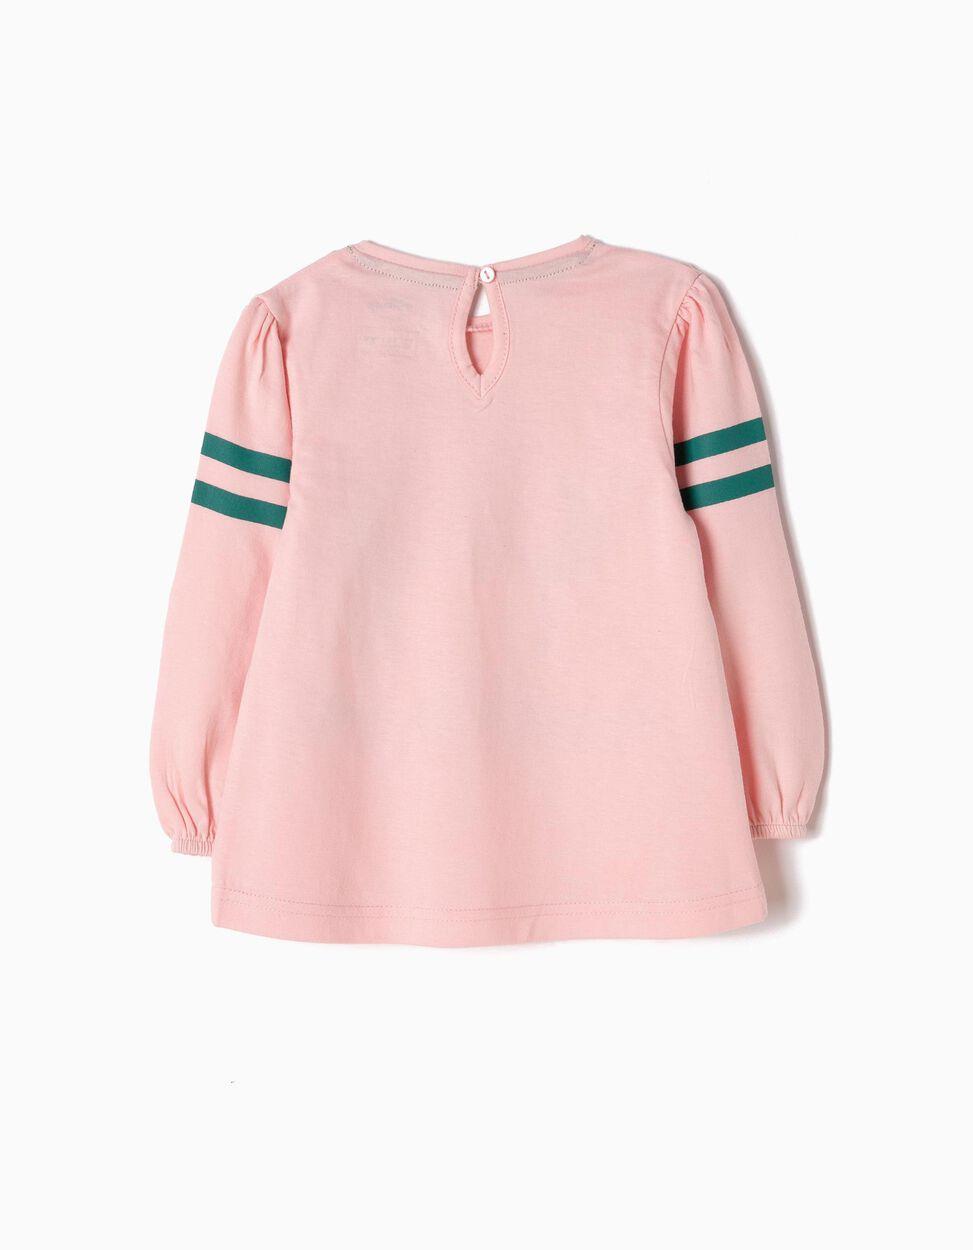 T-shirt Manga Comprida Minnie Rosa